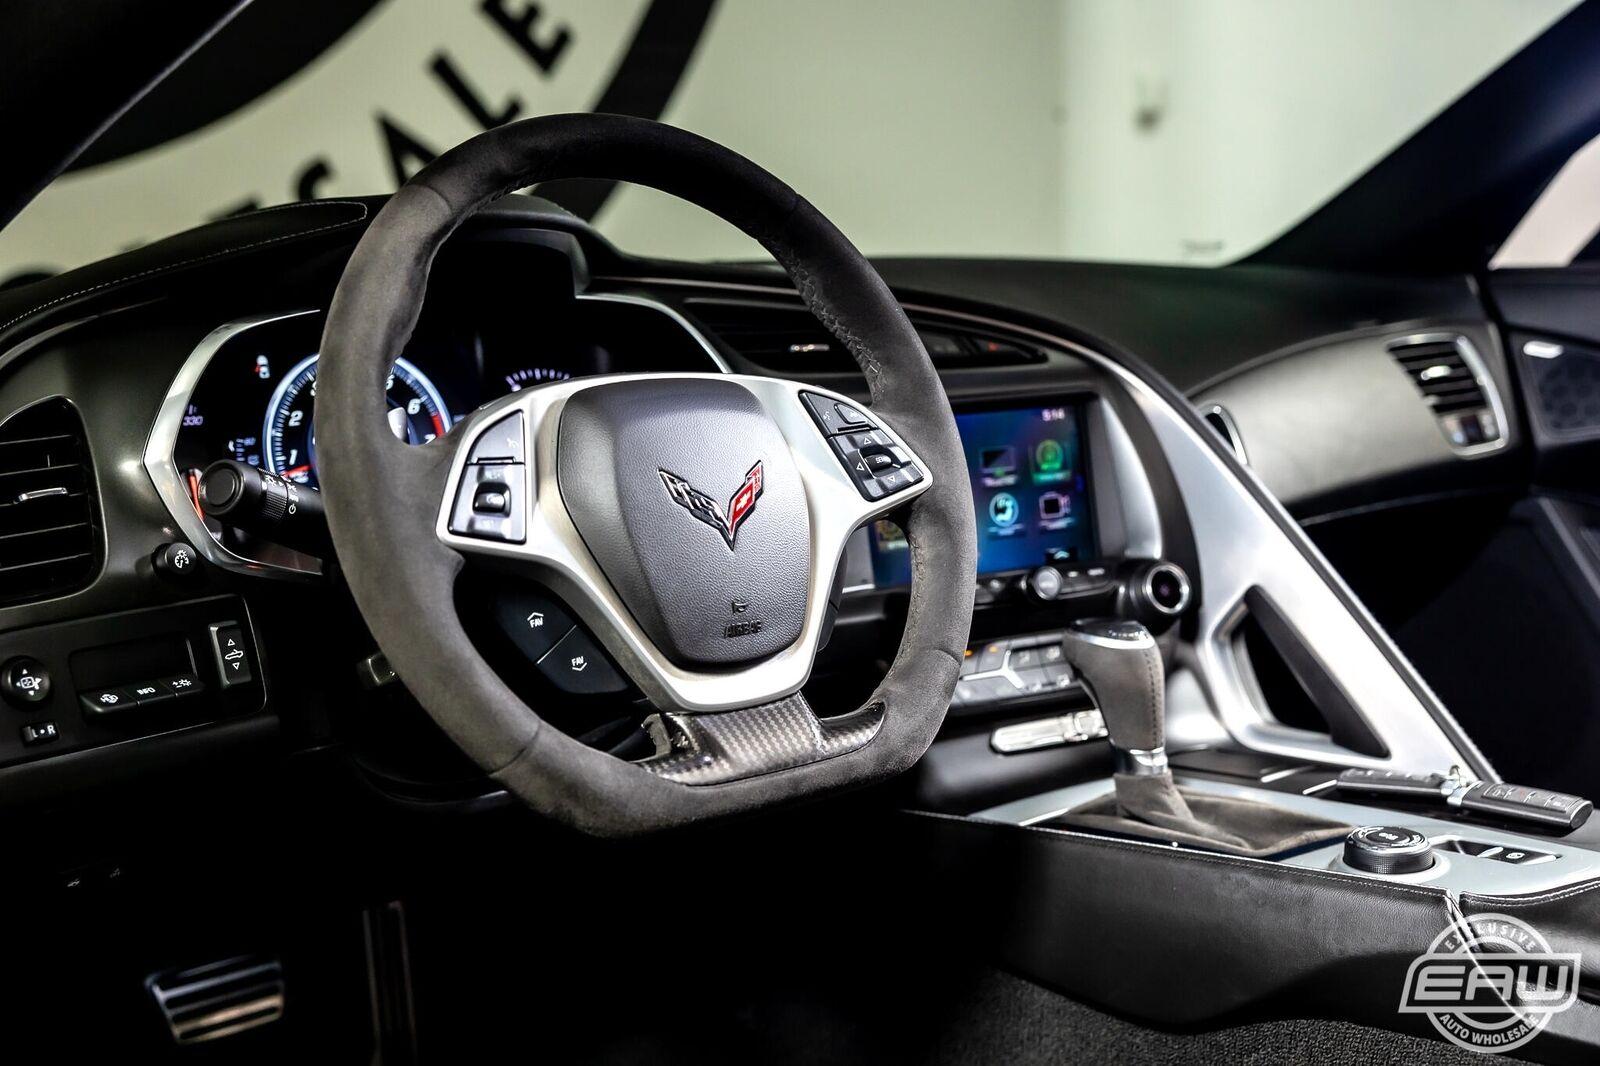 2019 Black Chevrolet Corvette Convertible 2LT | C7 Corvette Photo 10